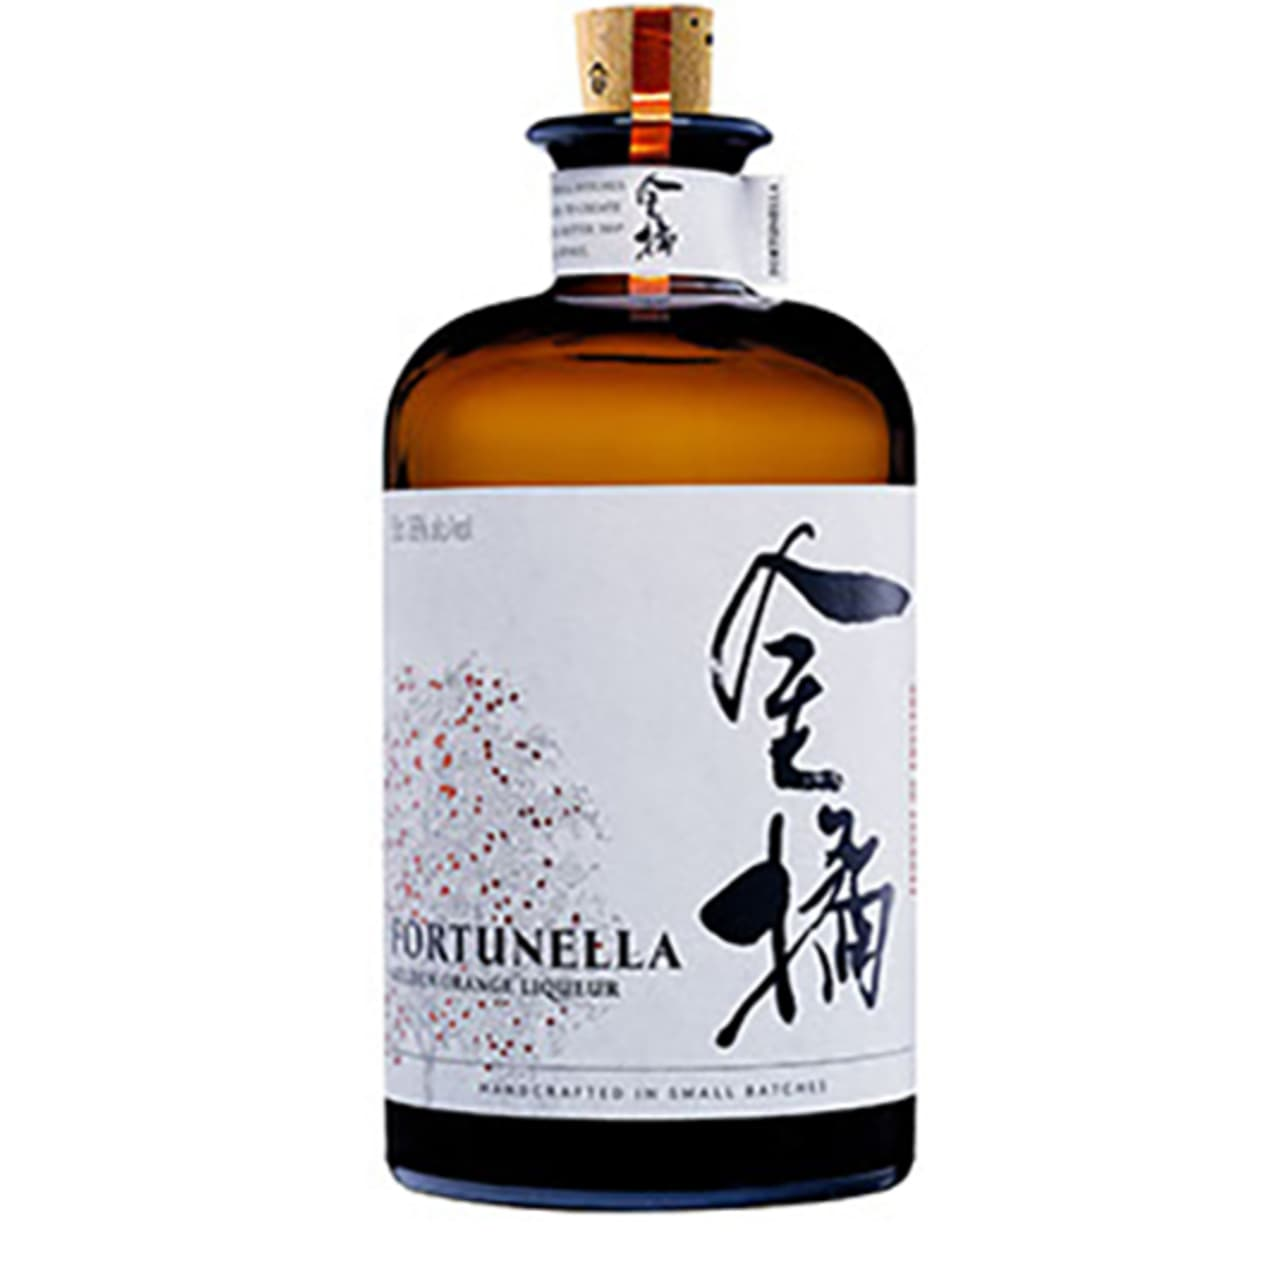 Product Image - Fortunella Golden Orange Liqueur